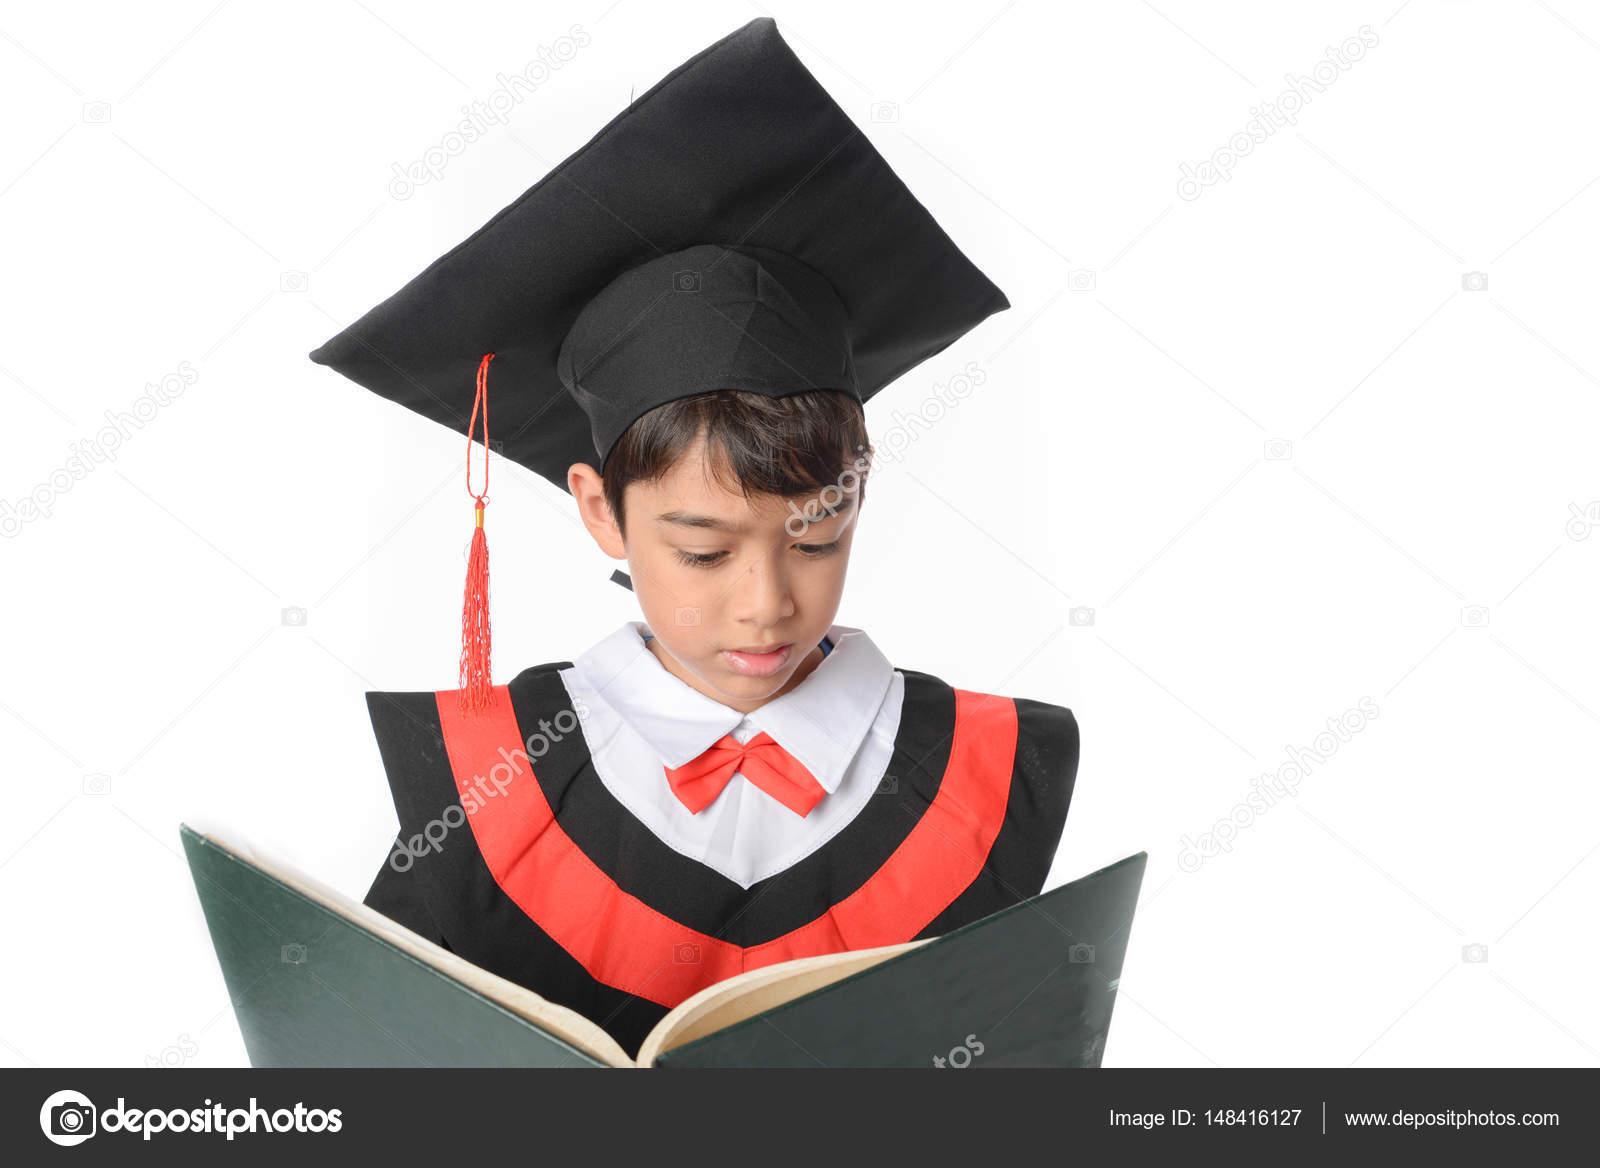 Boy in Graduation Gown Bachelor Robe Cap Academic Dress Kids Cosplay ...